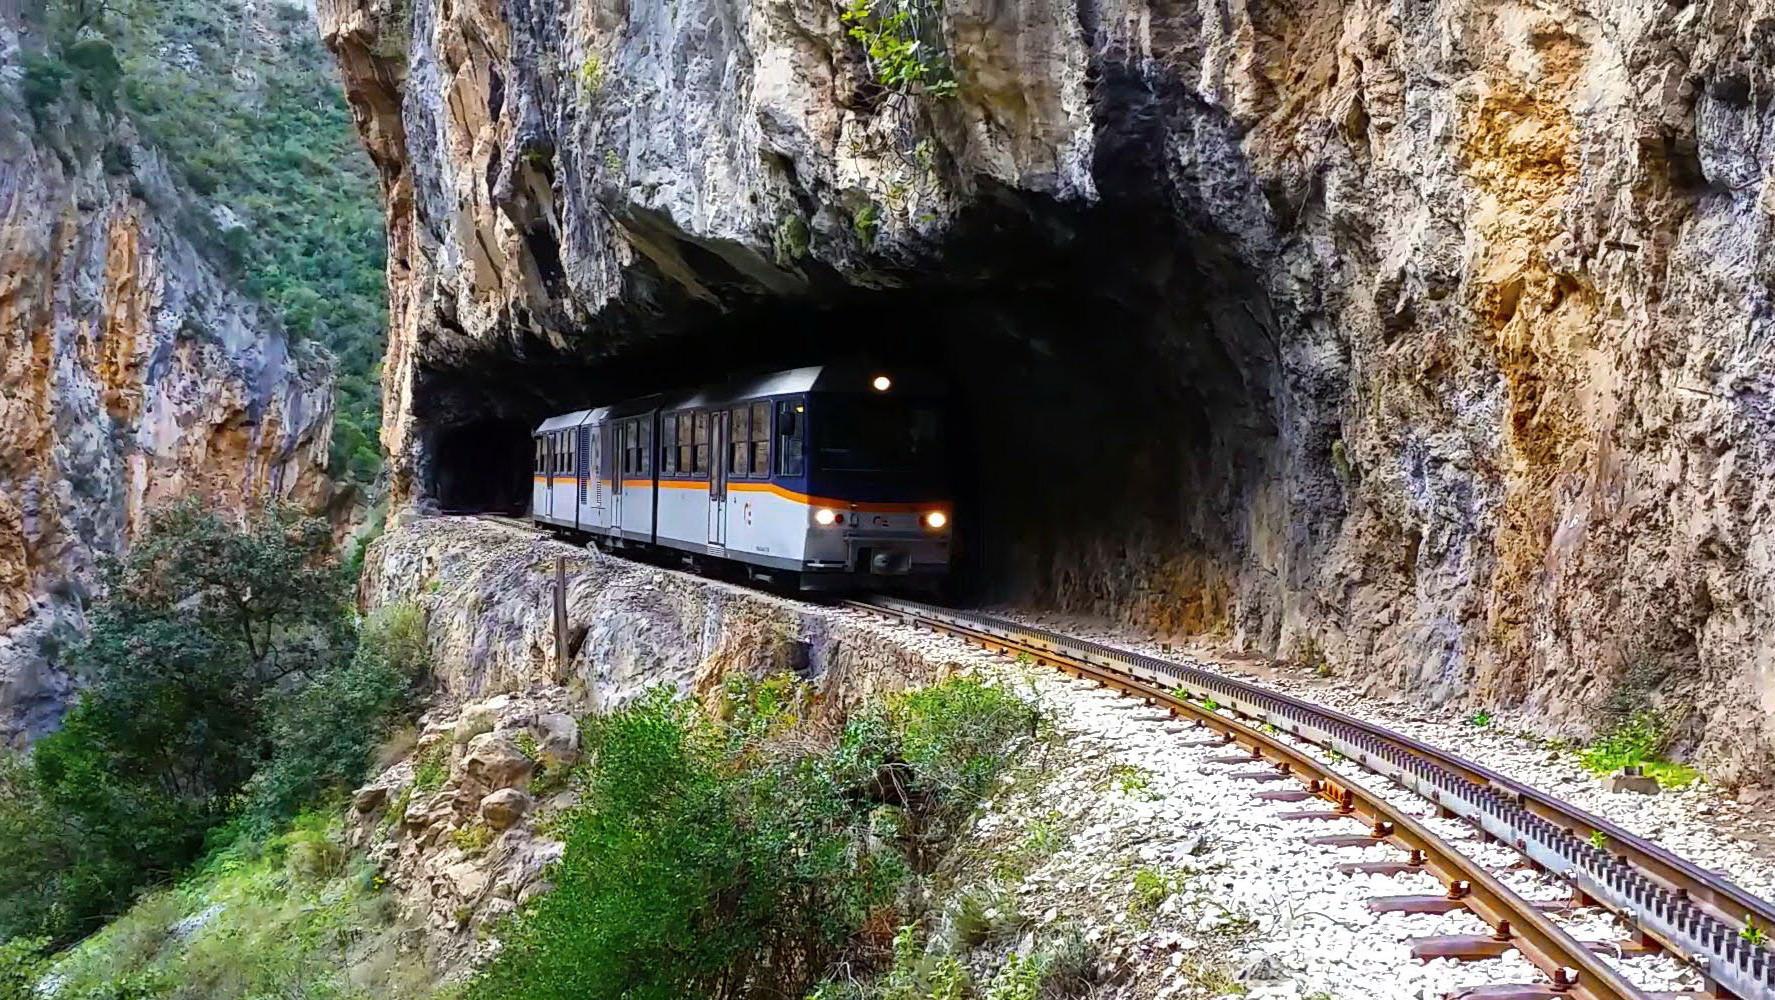 RACK RAILWAY TRAIN